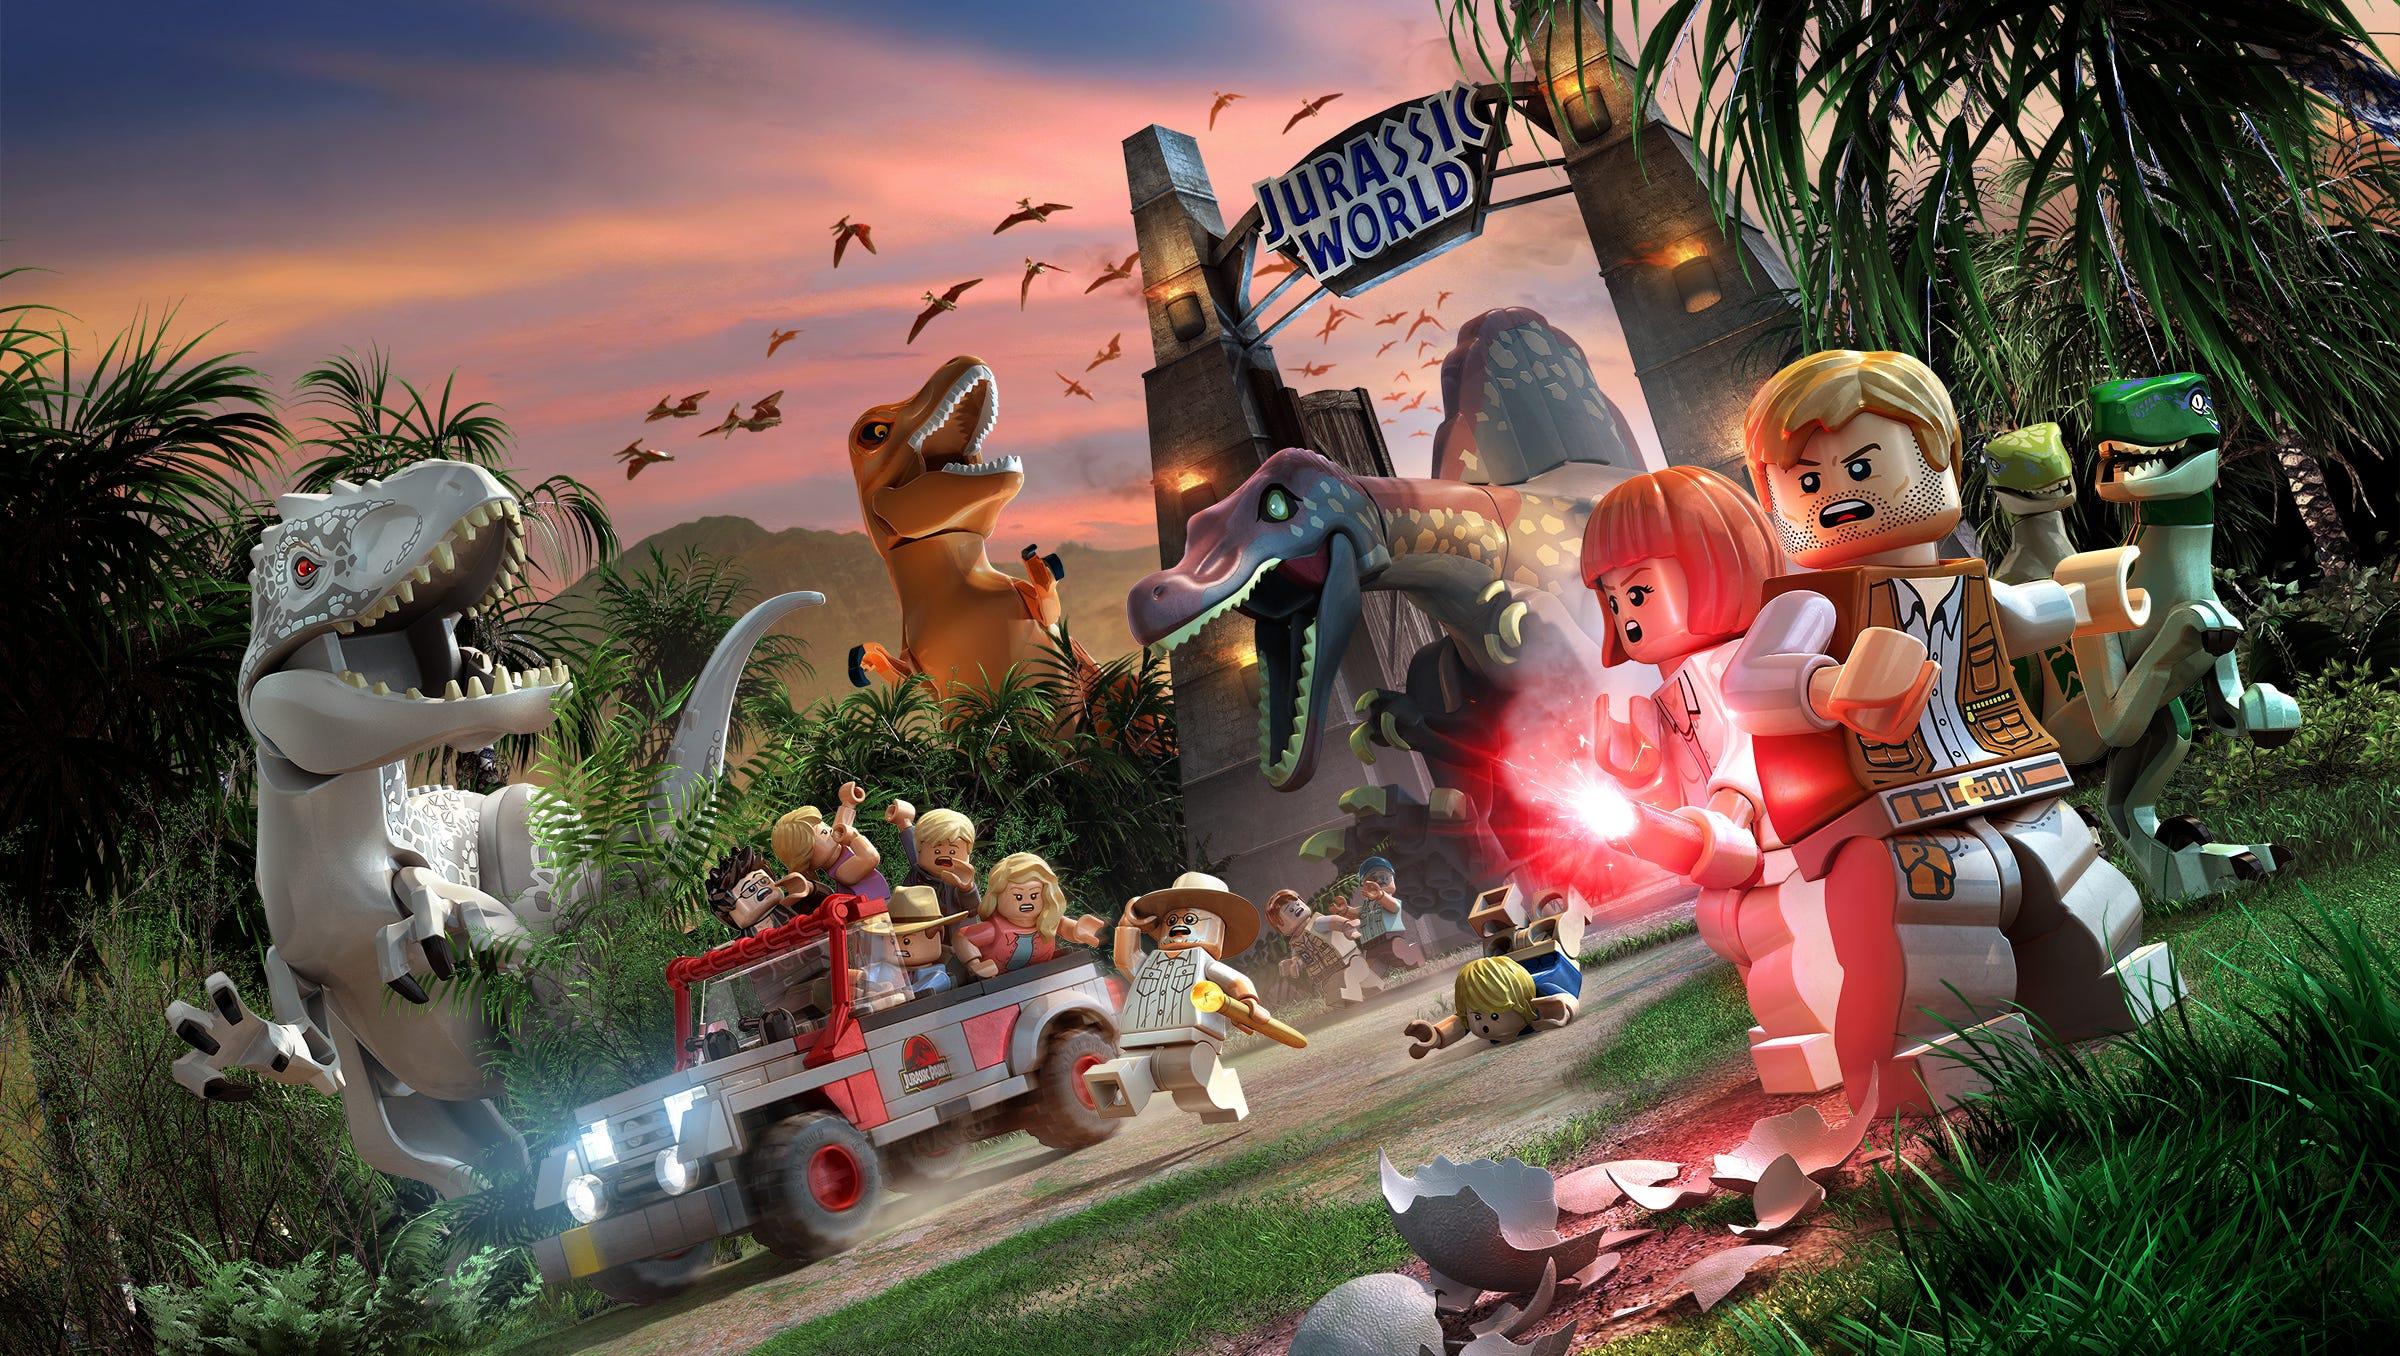 Technobubble: LEGO Jurassic World video game review